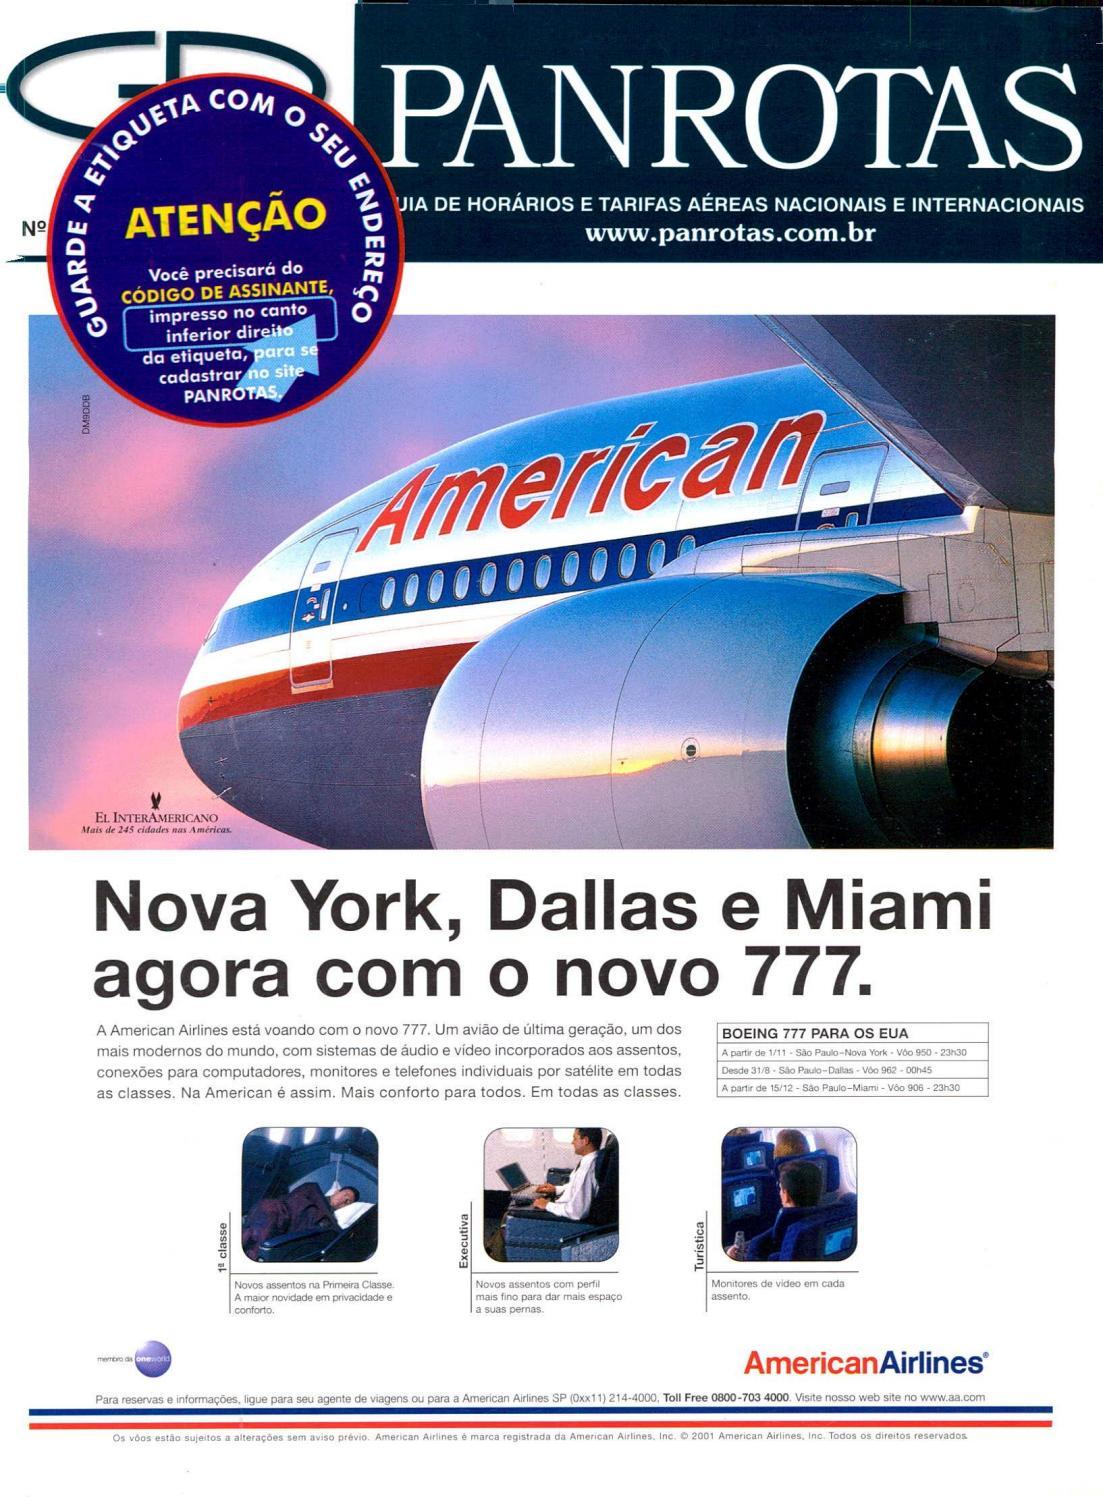 d226024c387 Guia Panrotas - Edição 344 - Novembro 2001 by PANROTAS Editora - issuu